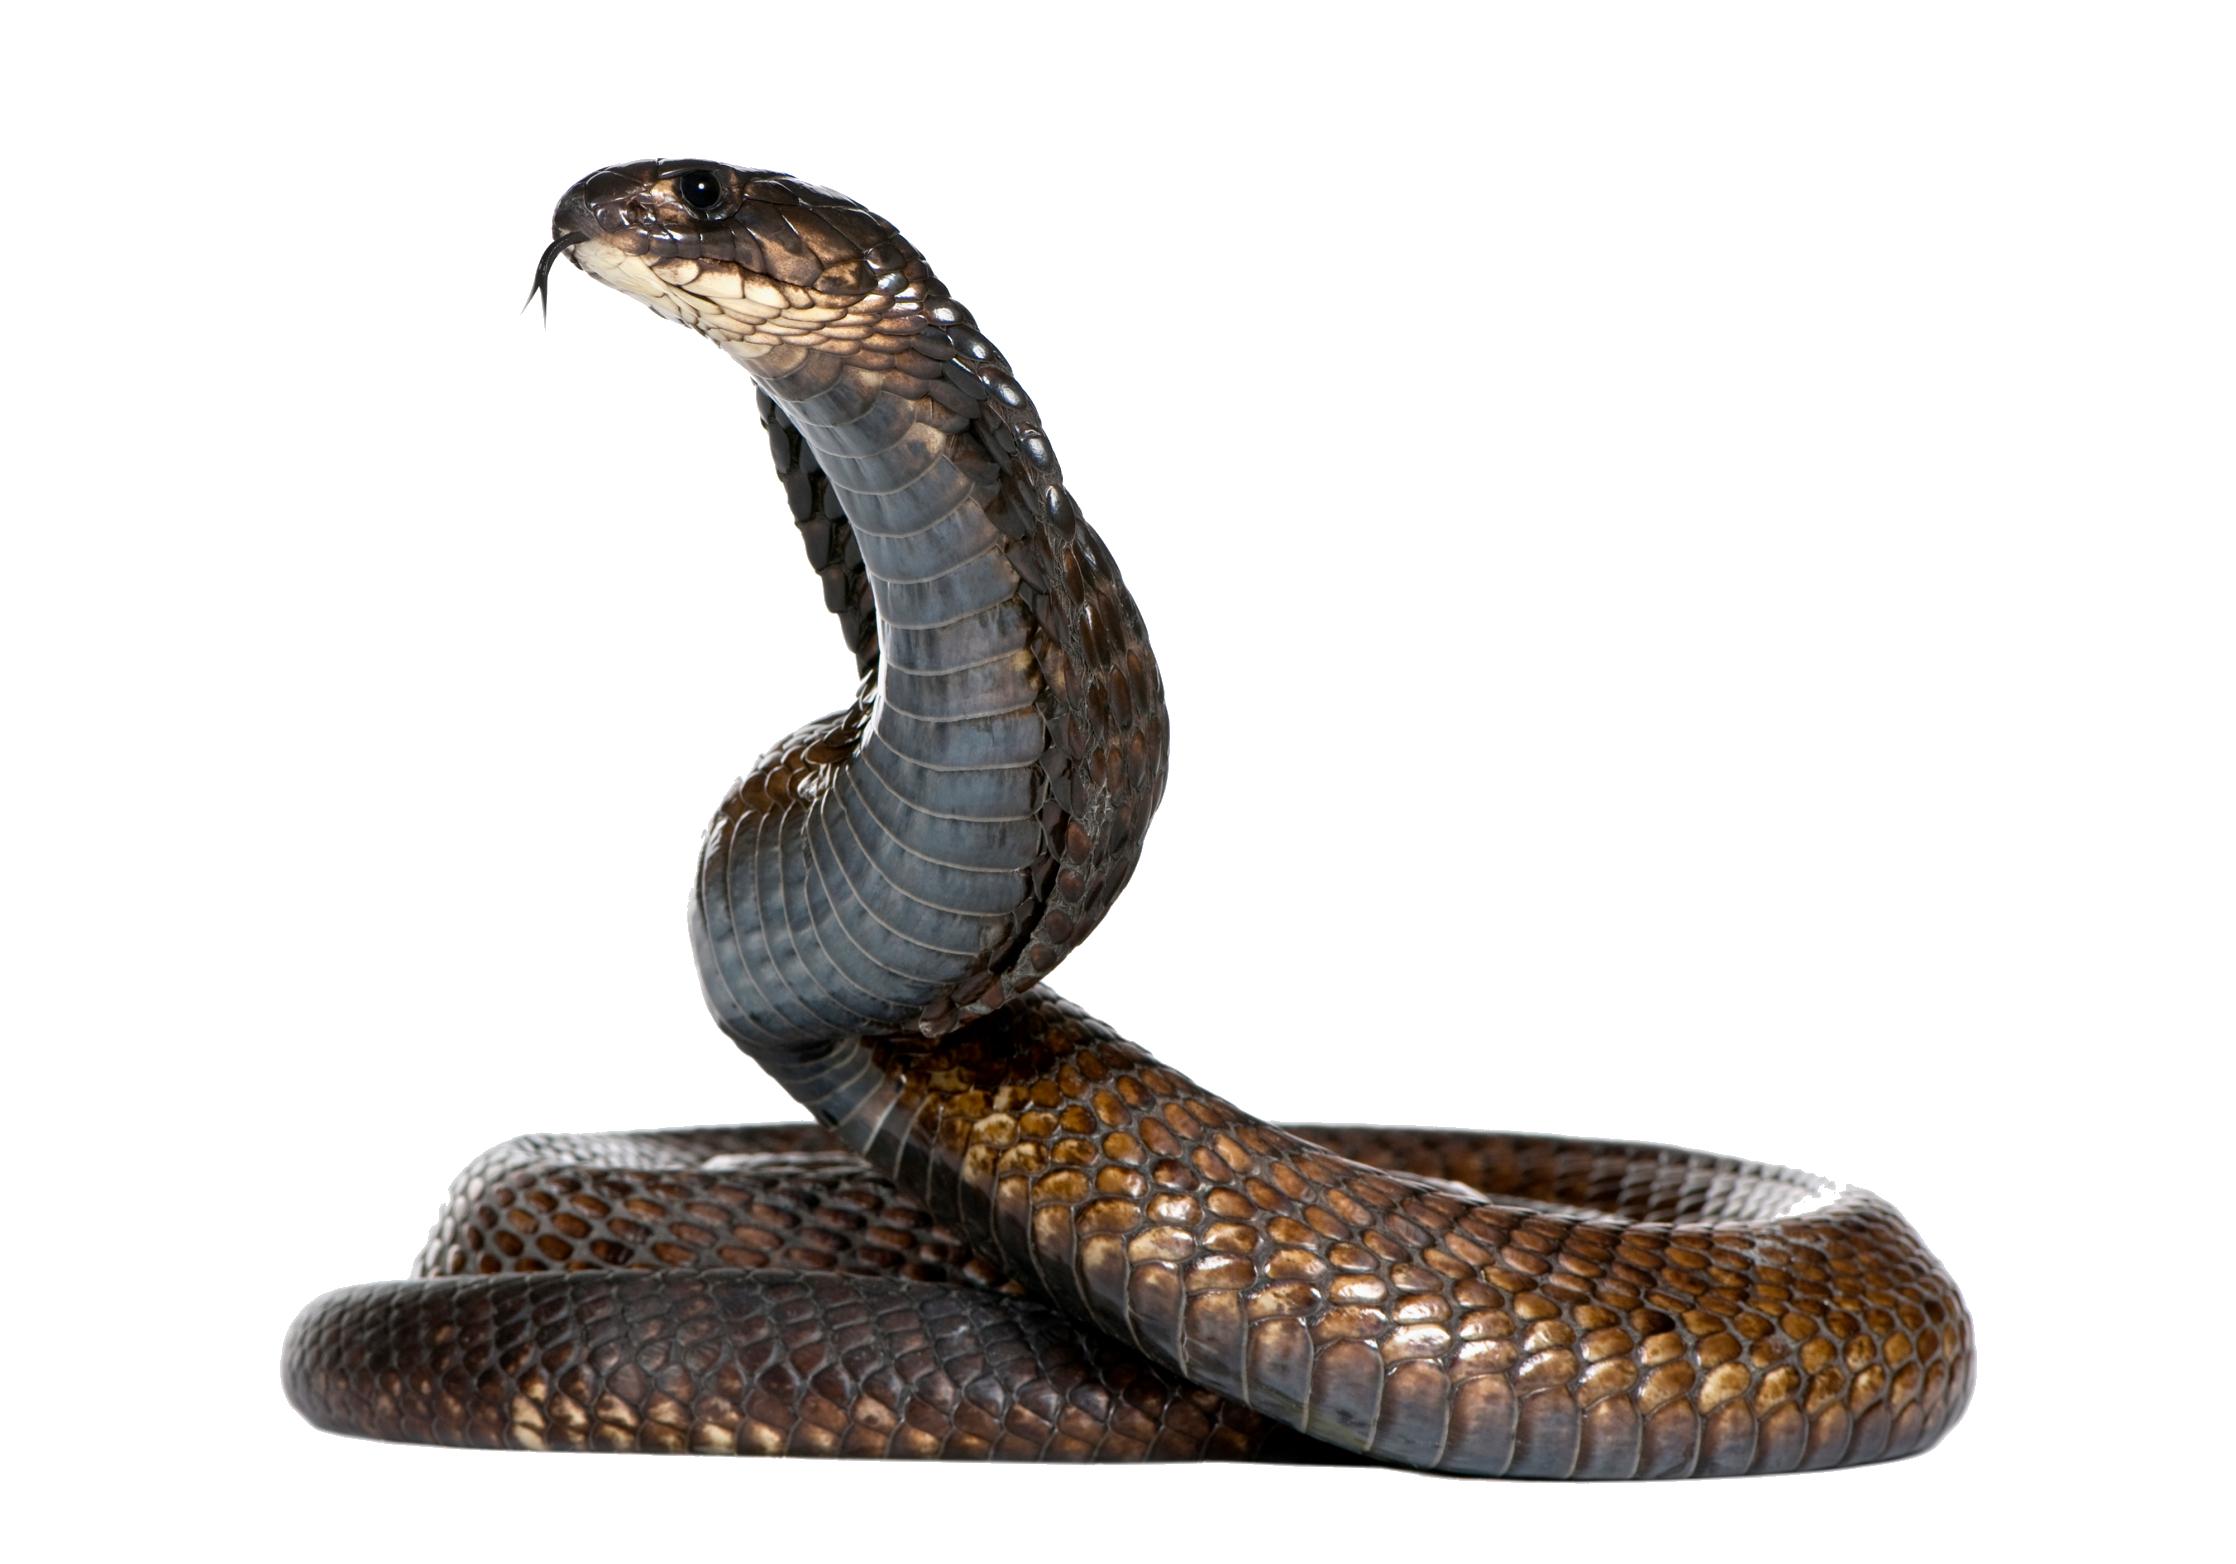 Dangerous Black Snake Png Image Purepng Free Transparent Cc0 Png Image Library Snake Black Mamba Snake Png Images